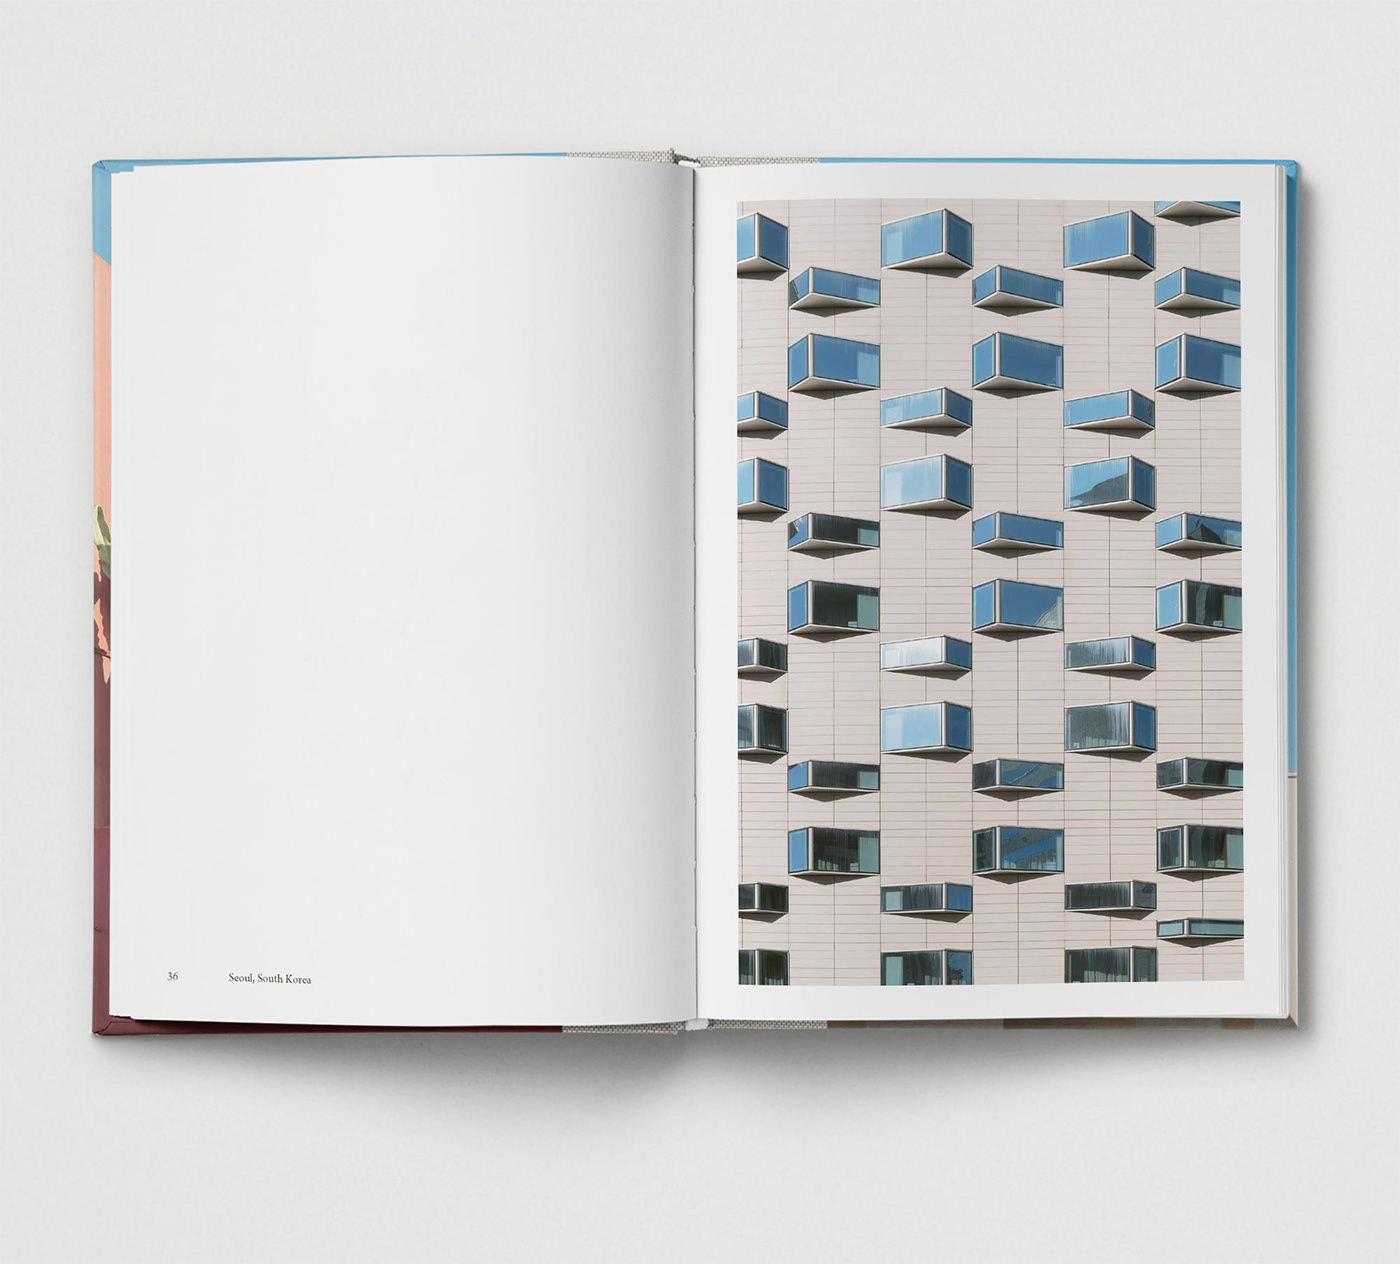 architecture book book design editorial Muralla Roja photo book Ricardo Bofill Urban urban geometry urban photography